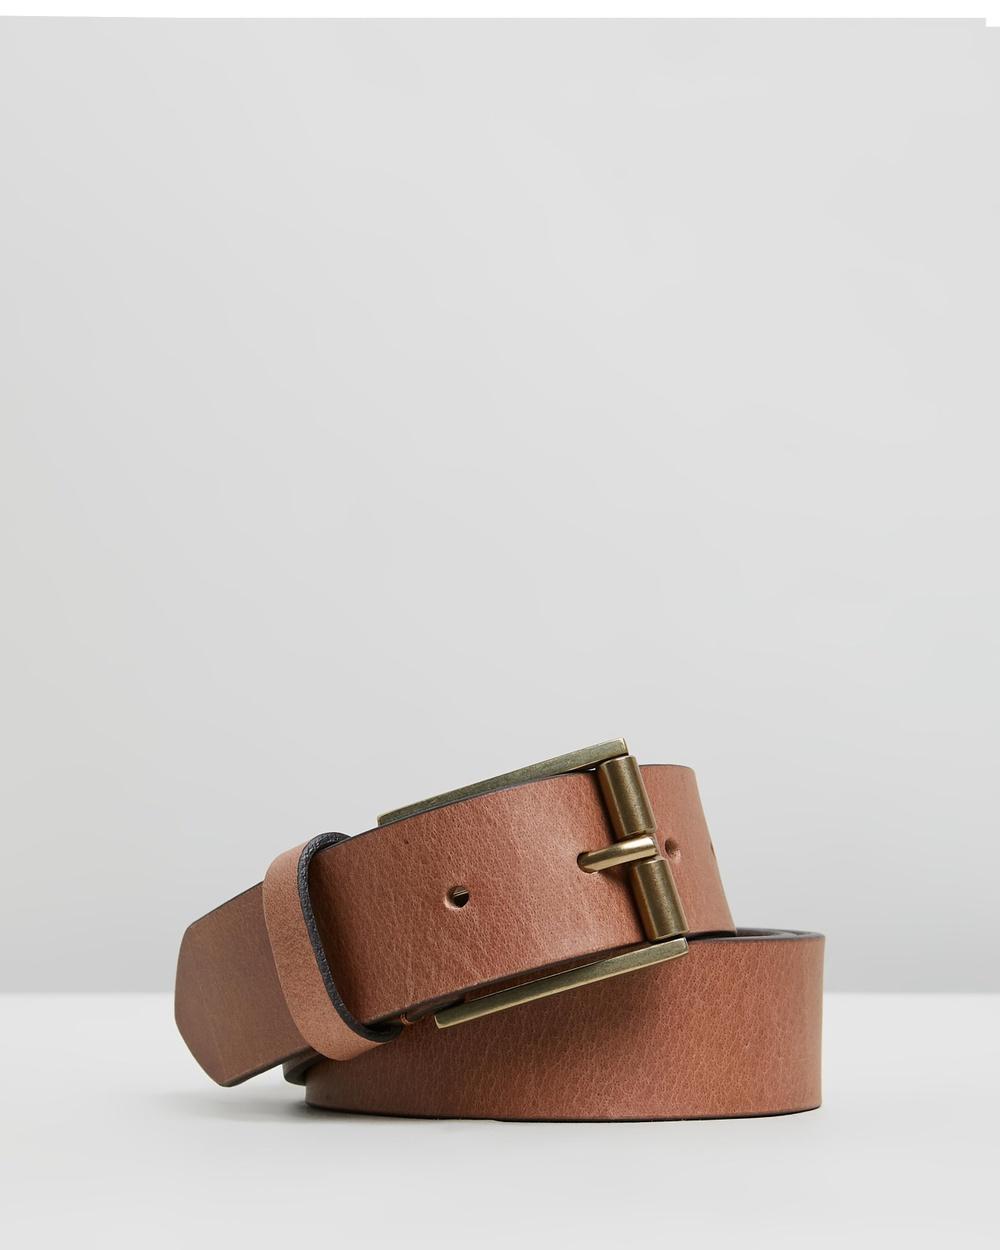 Double Oak Mills Smooth Leather 35mm Belt Belts Tan & Gold